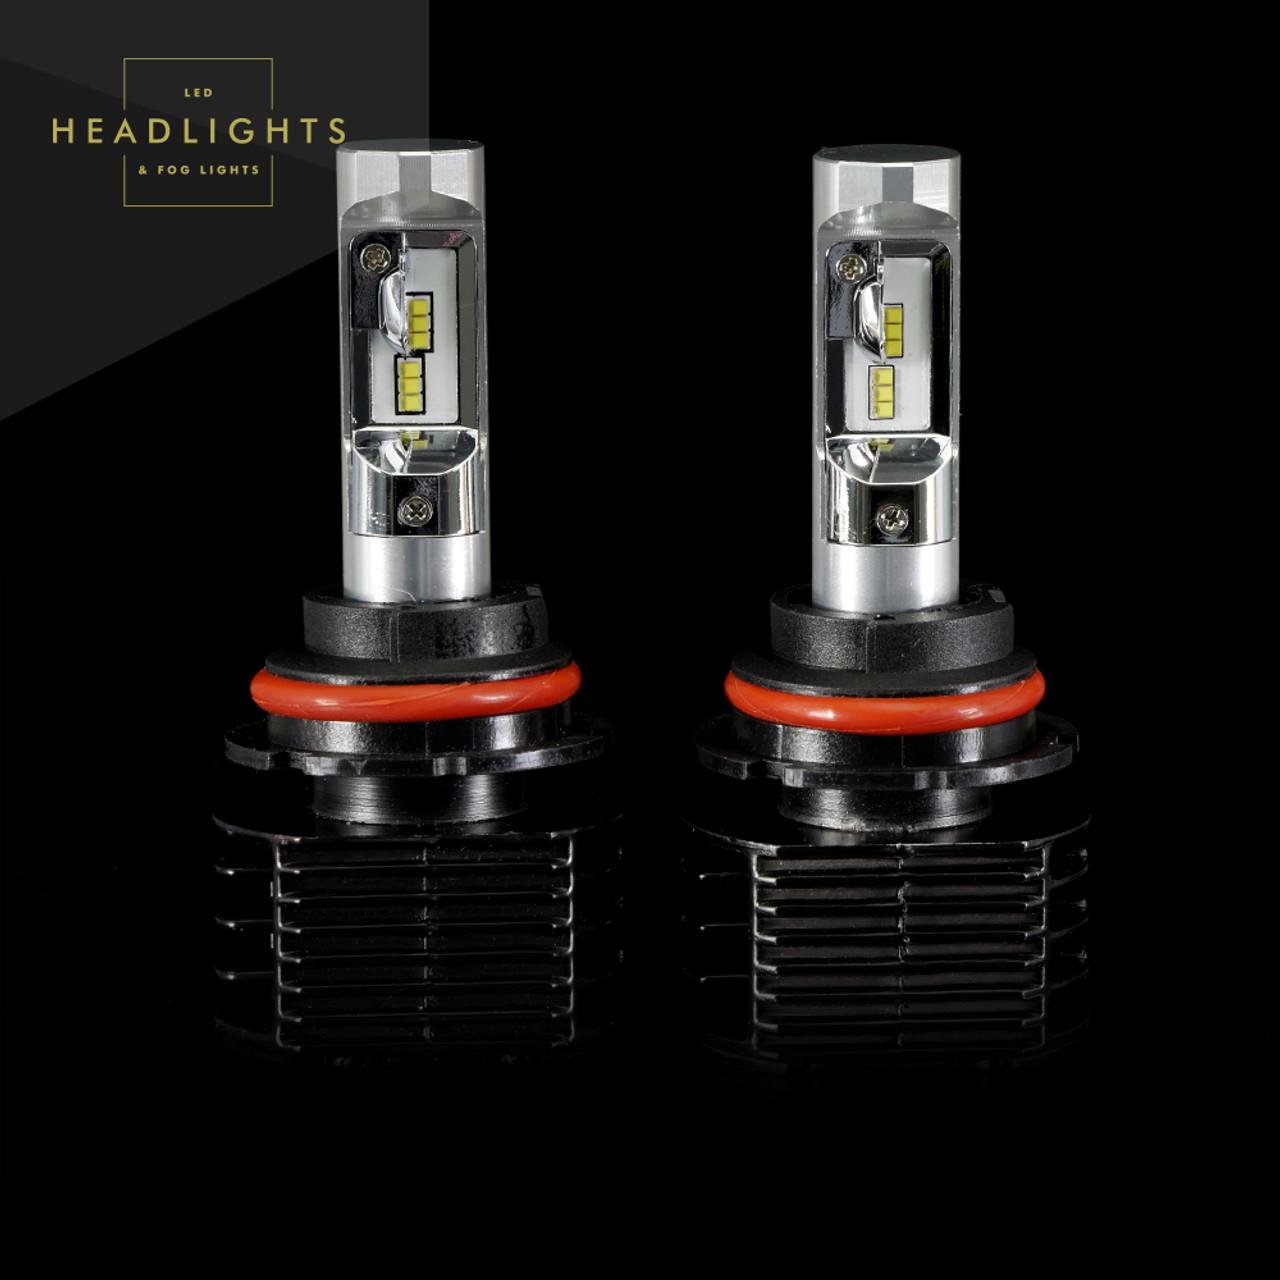 Gtr Lighting Ultra Series Led Headlight Bulbs 9007 Hb5 Cx